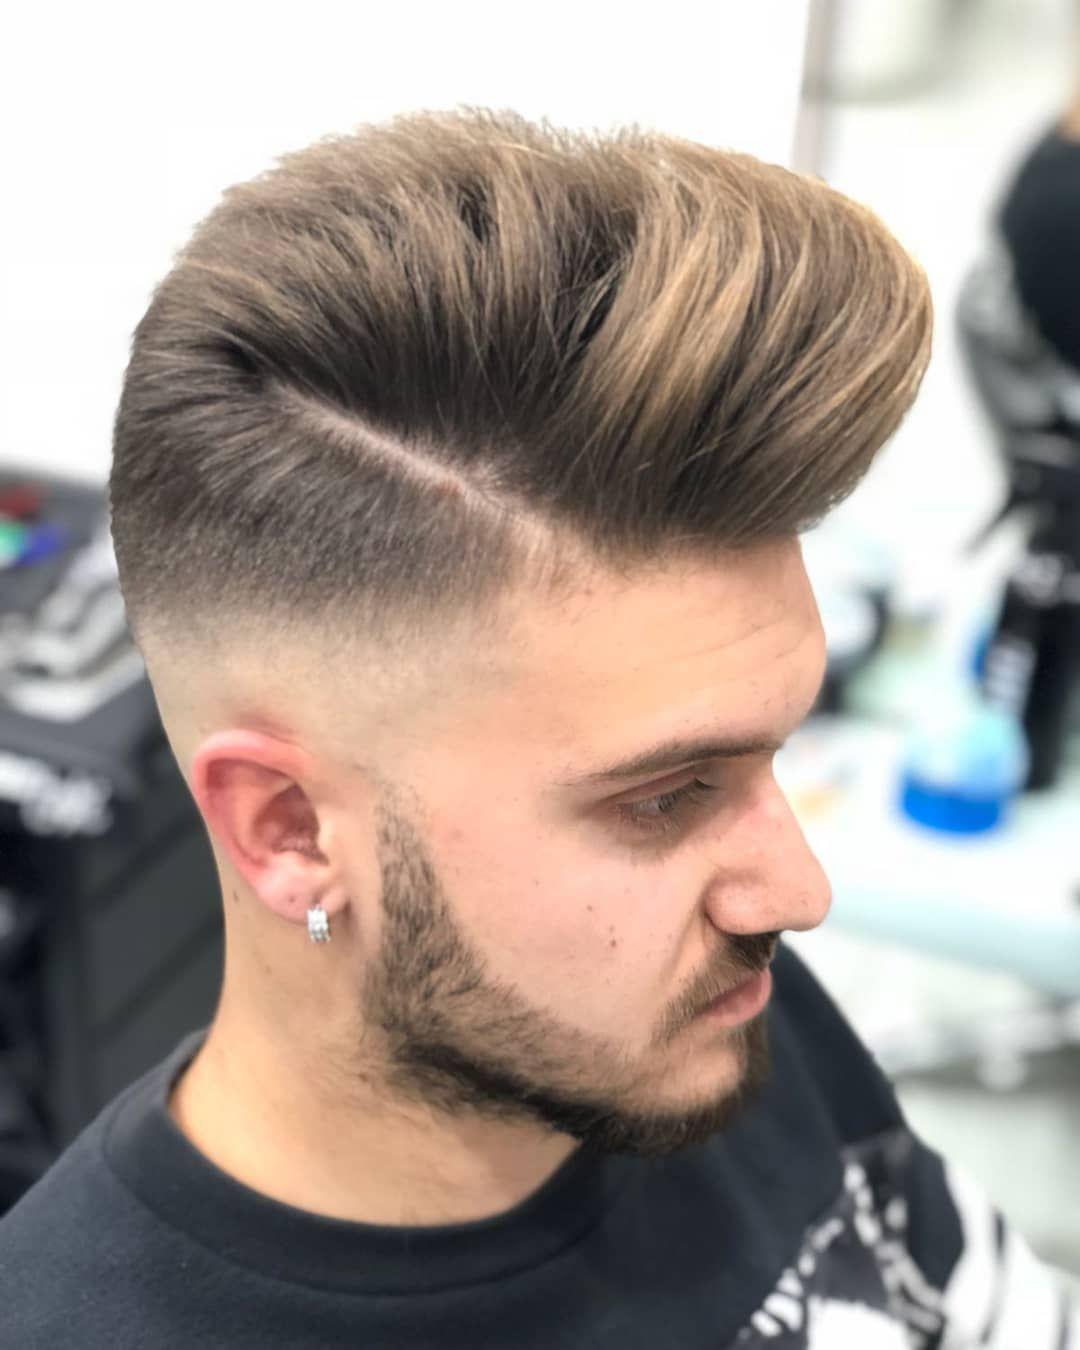 High pomp menshairstyles mens hairstyles pinterest hair